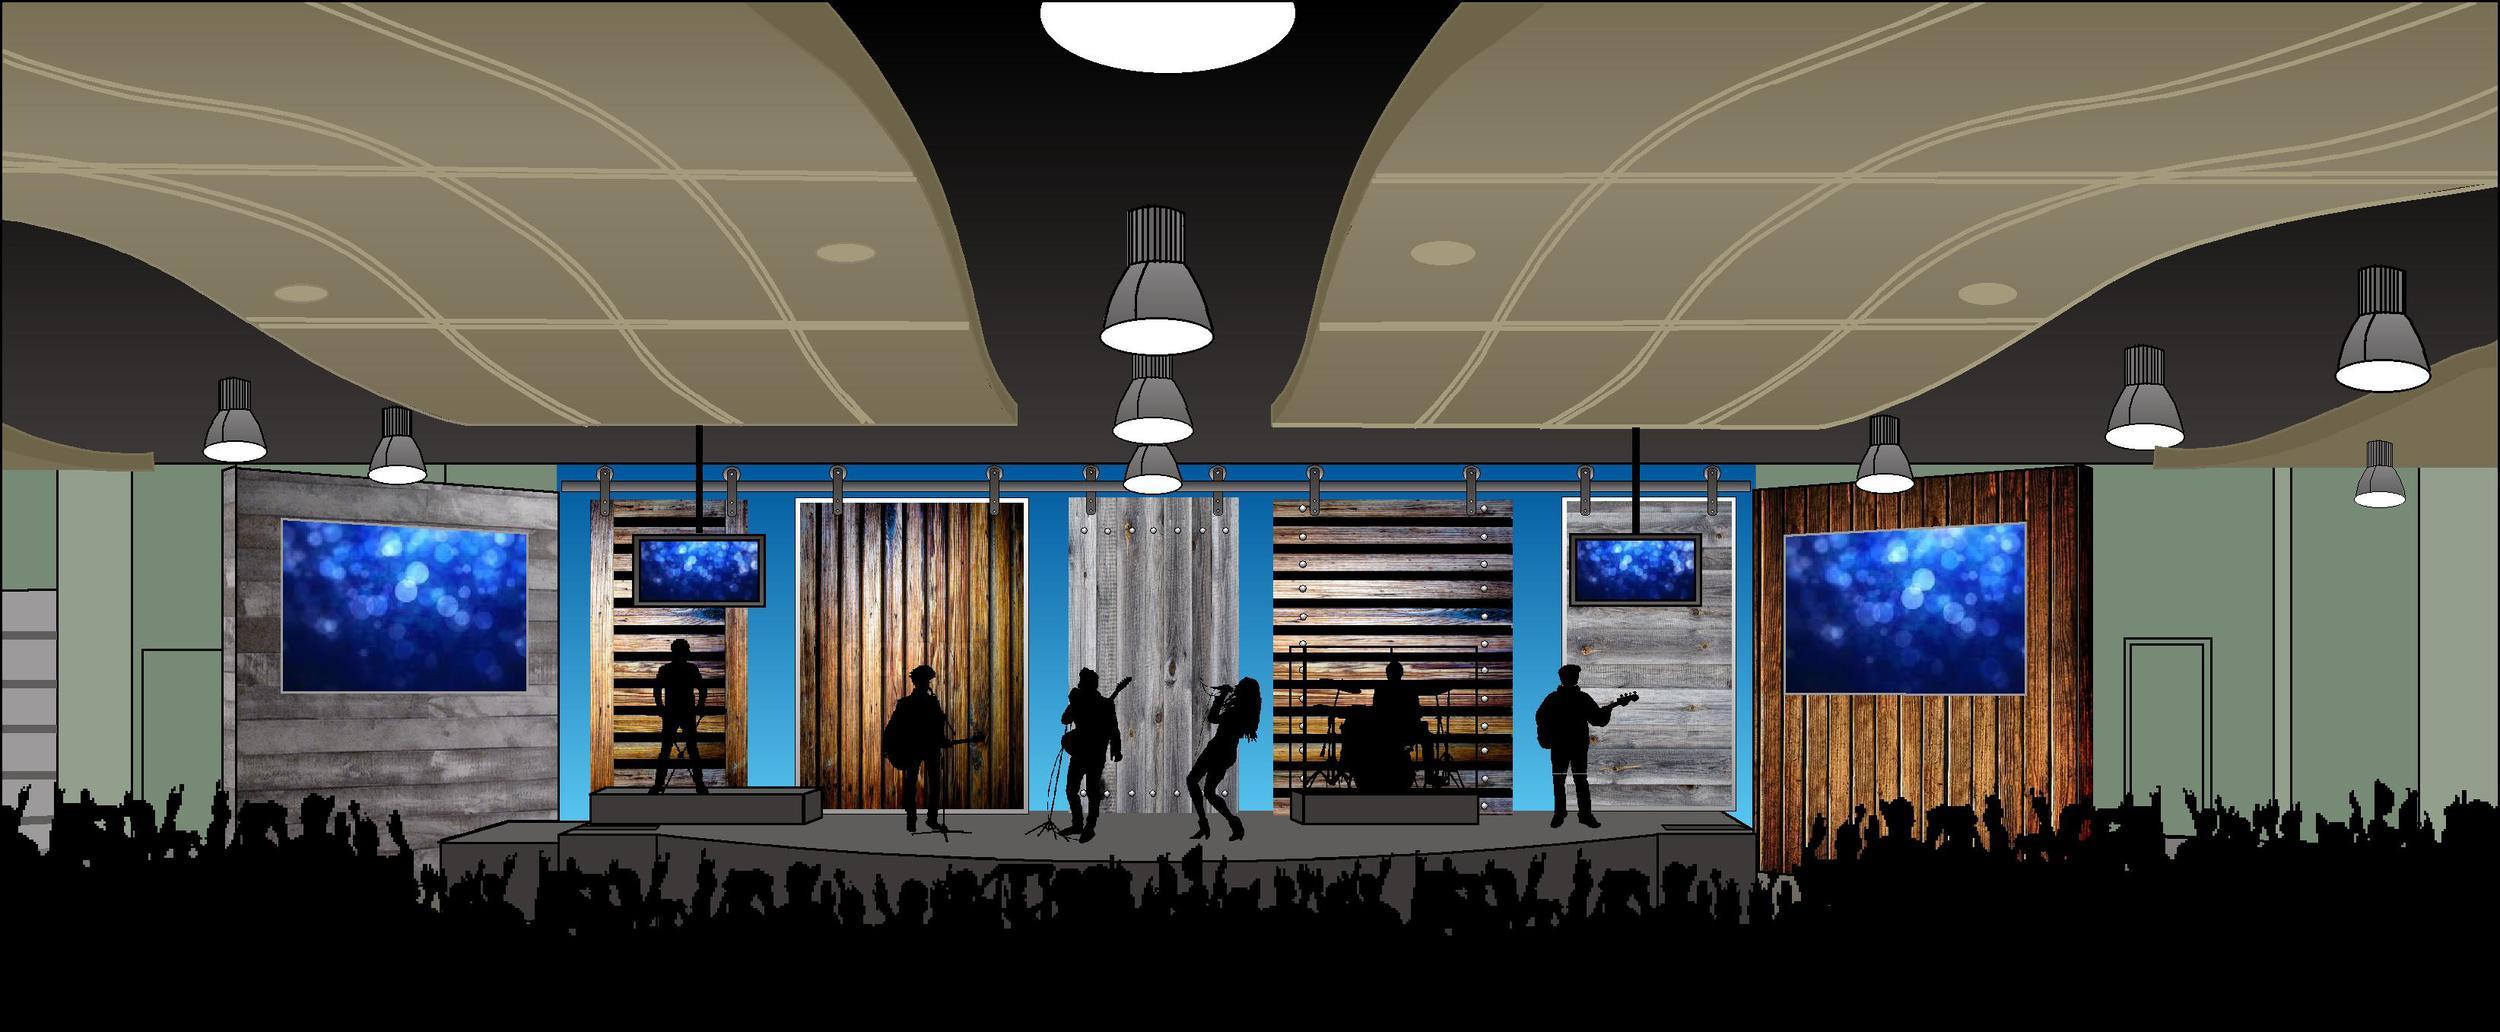 Influence Church Worship Center Design/Installation